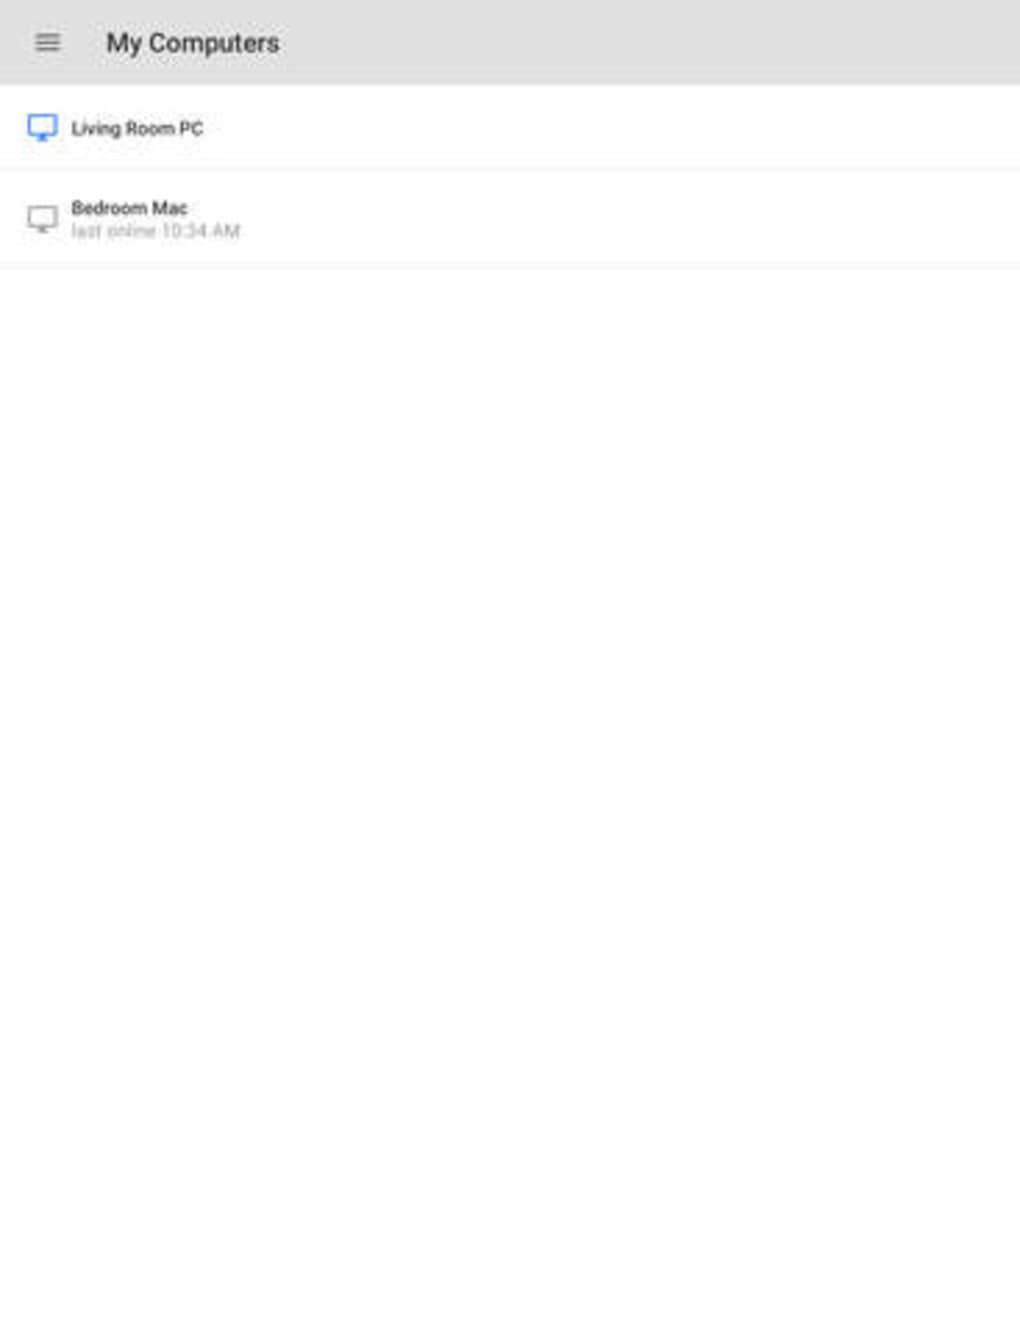 Chrome Remote Desktop for iPhone - Download